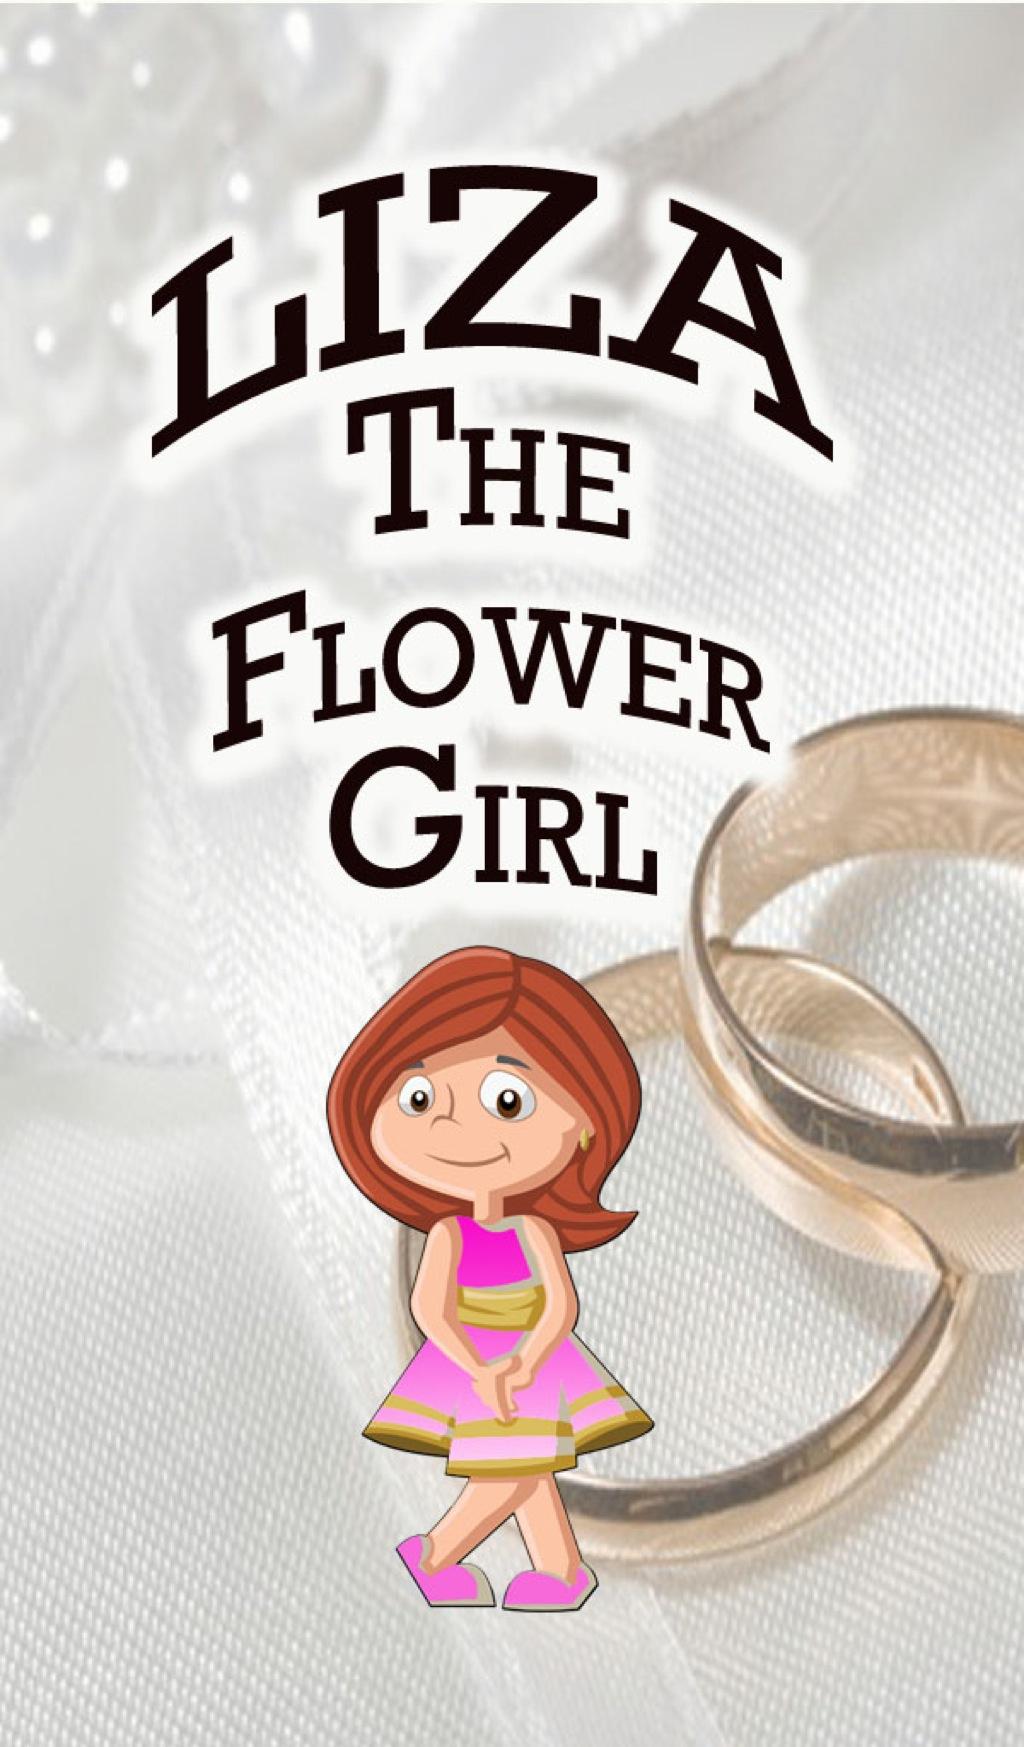 Liza the Flower Girl (eBook)